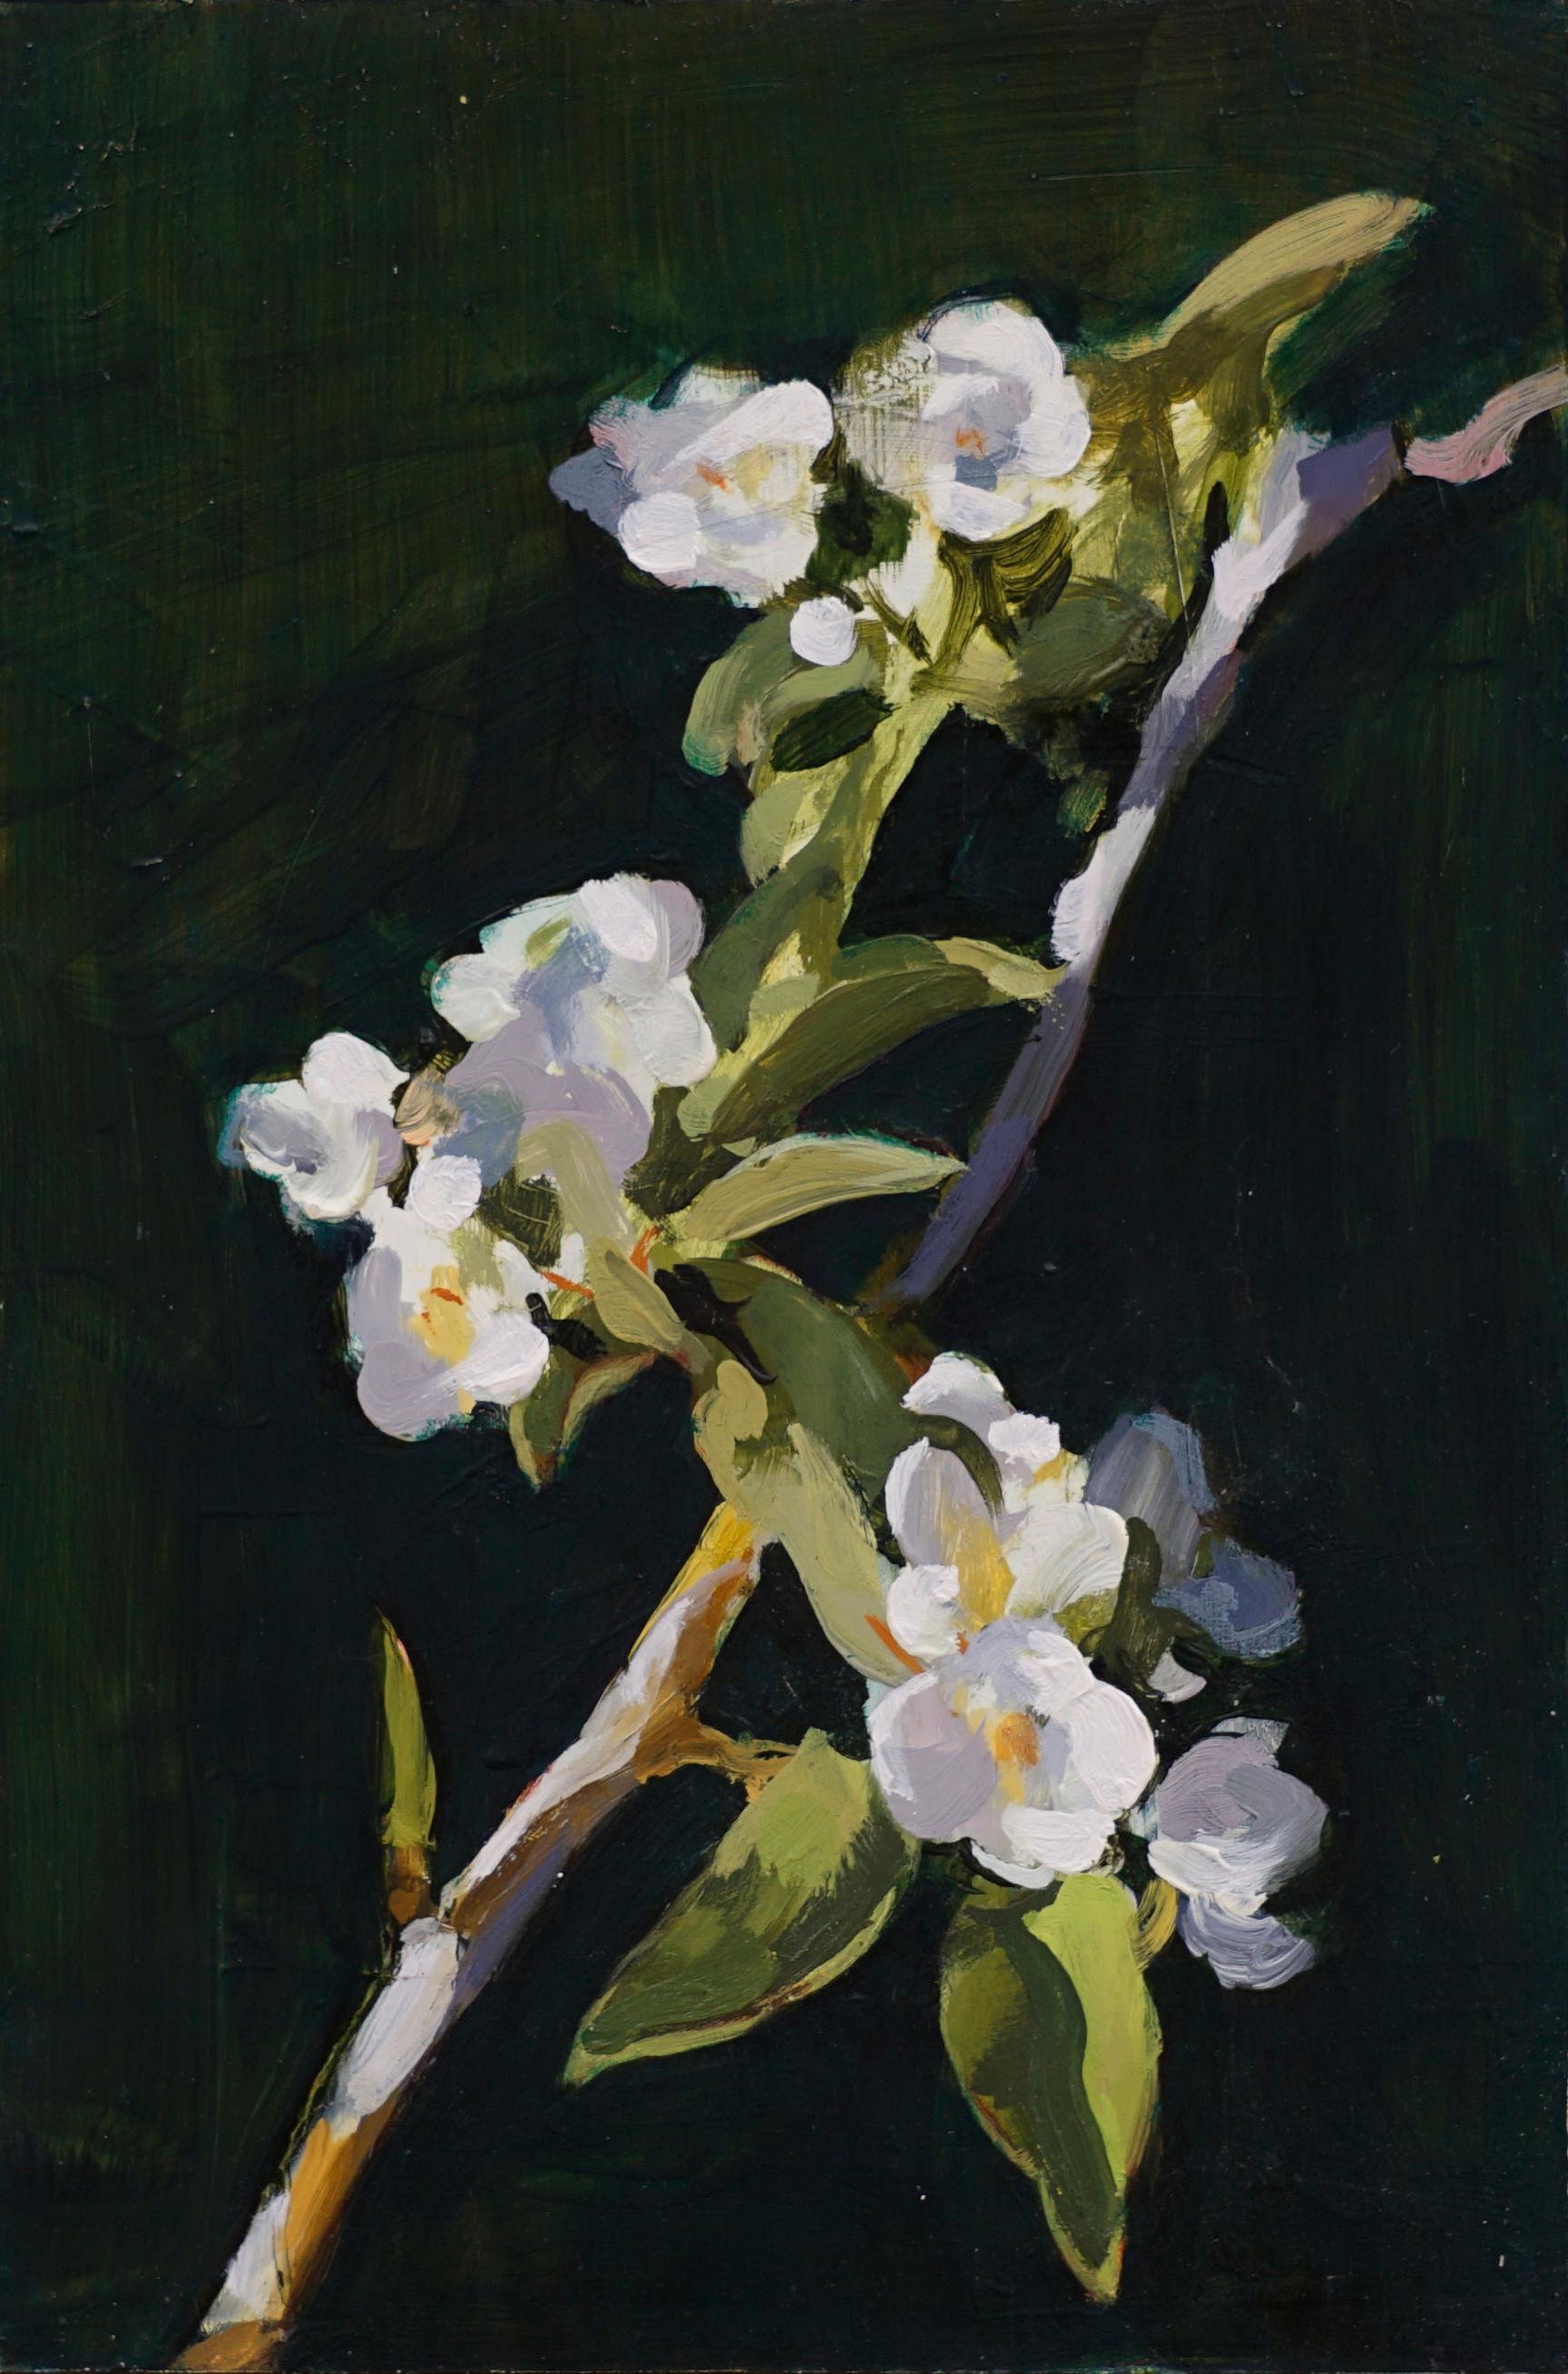 mark-crenshaw-1723-pear-blossom-a.jpg